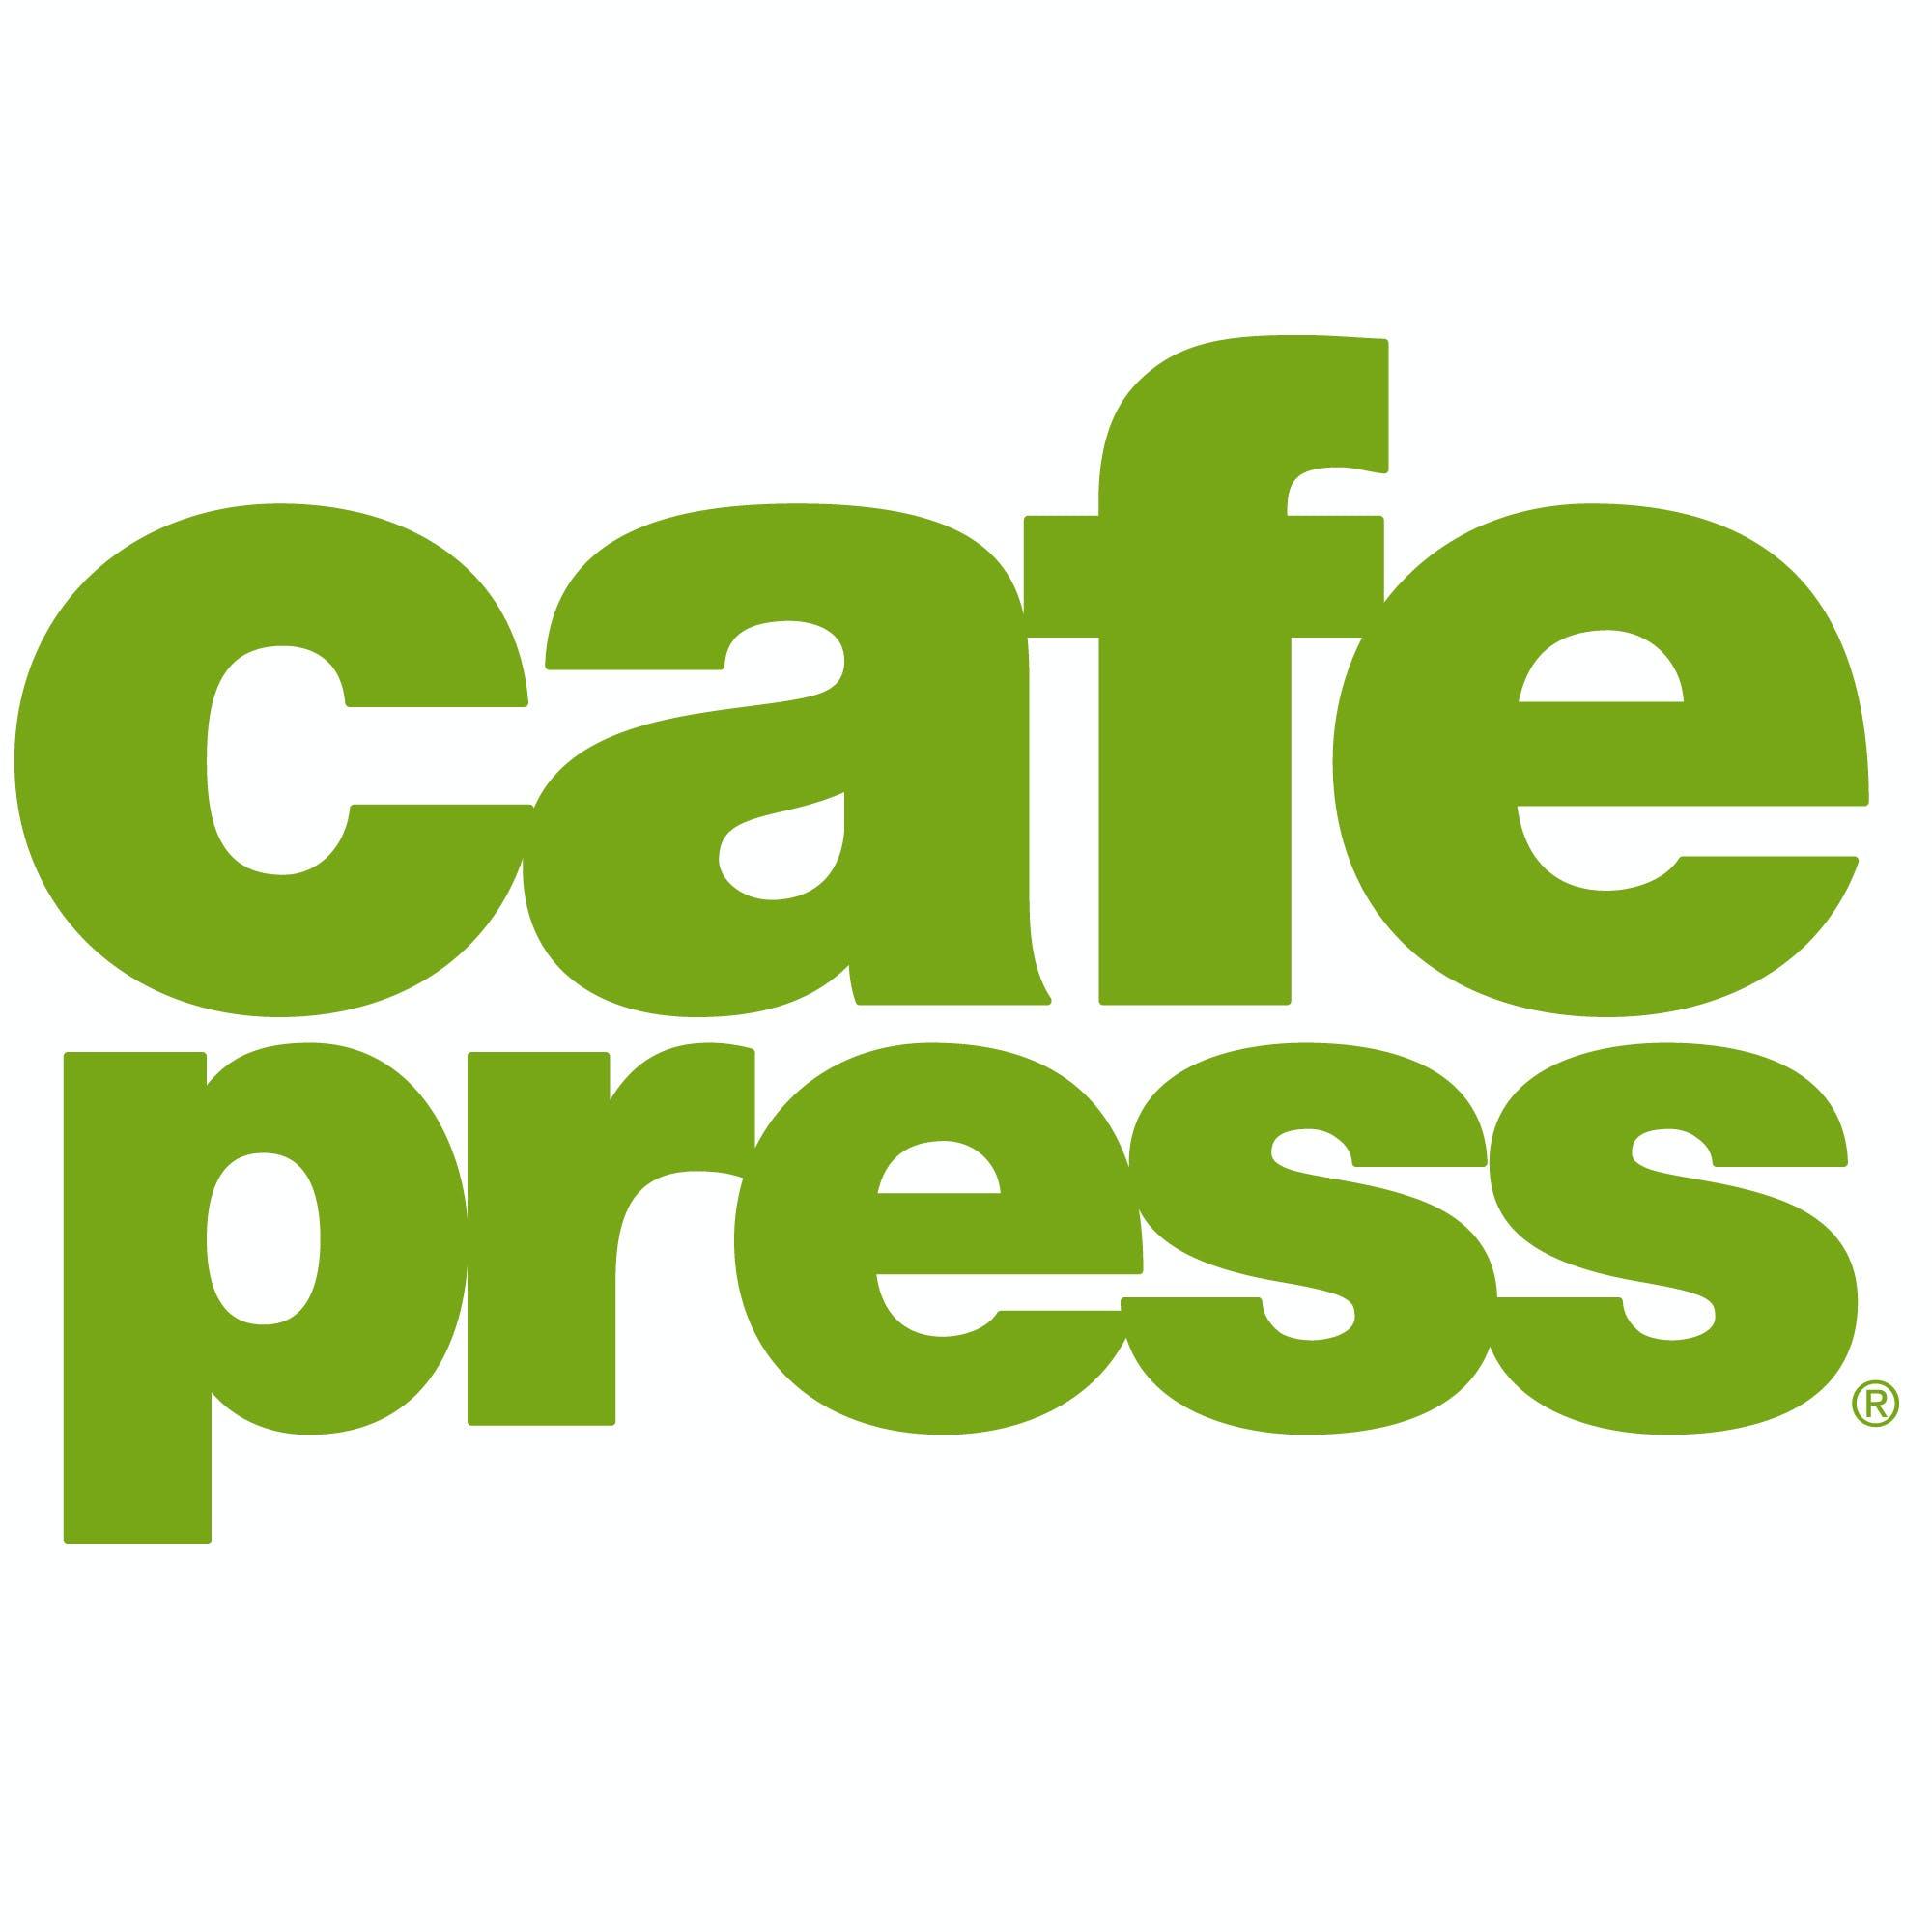 CafePress logo